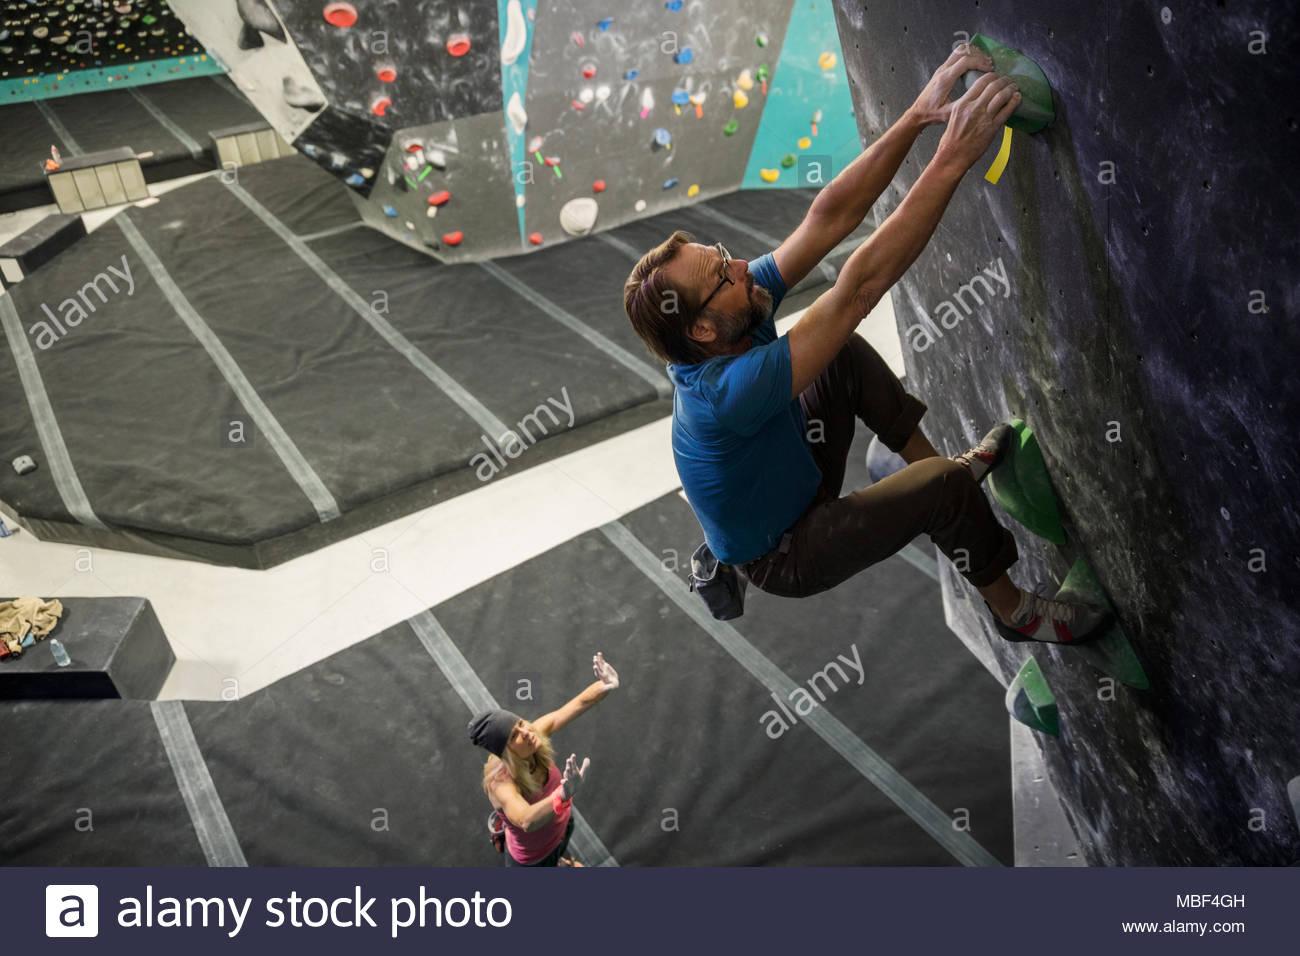 Woman spotting, guiding mature male rock climber climbing wall at climbing gym - Stock Image